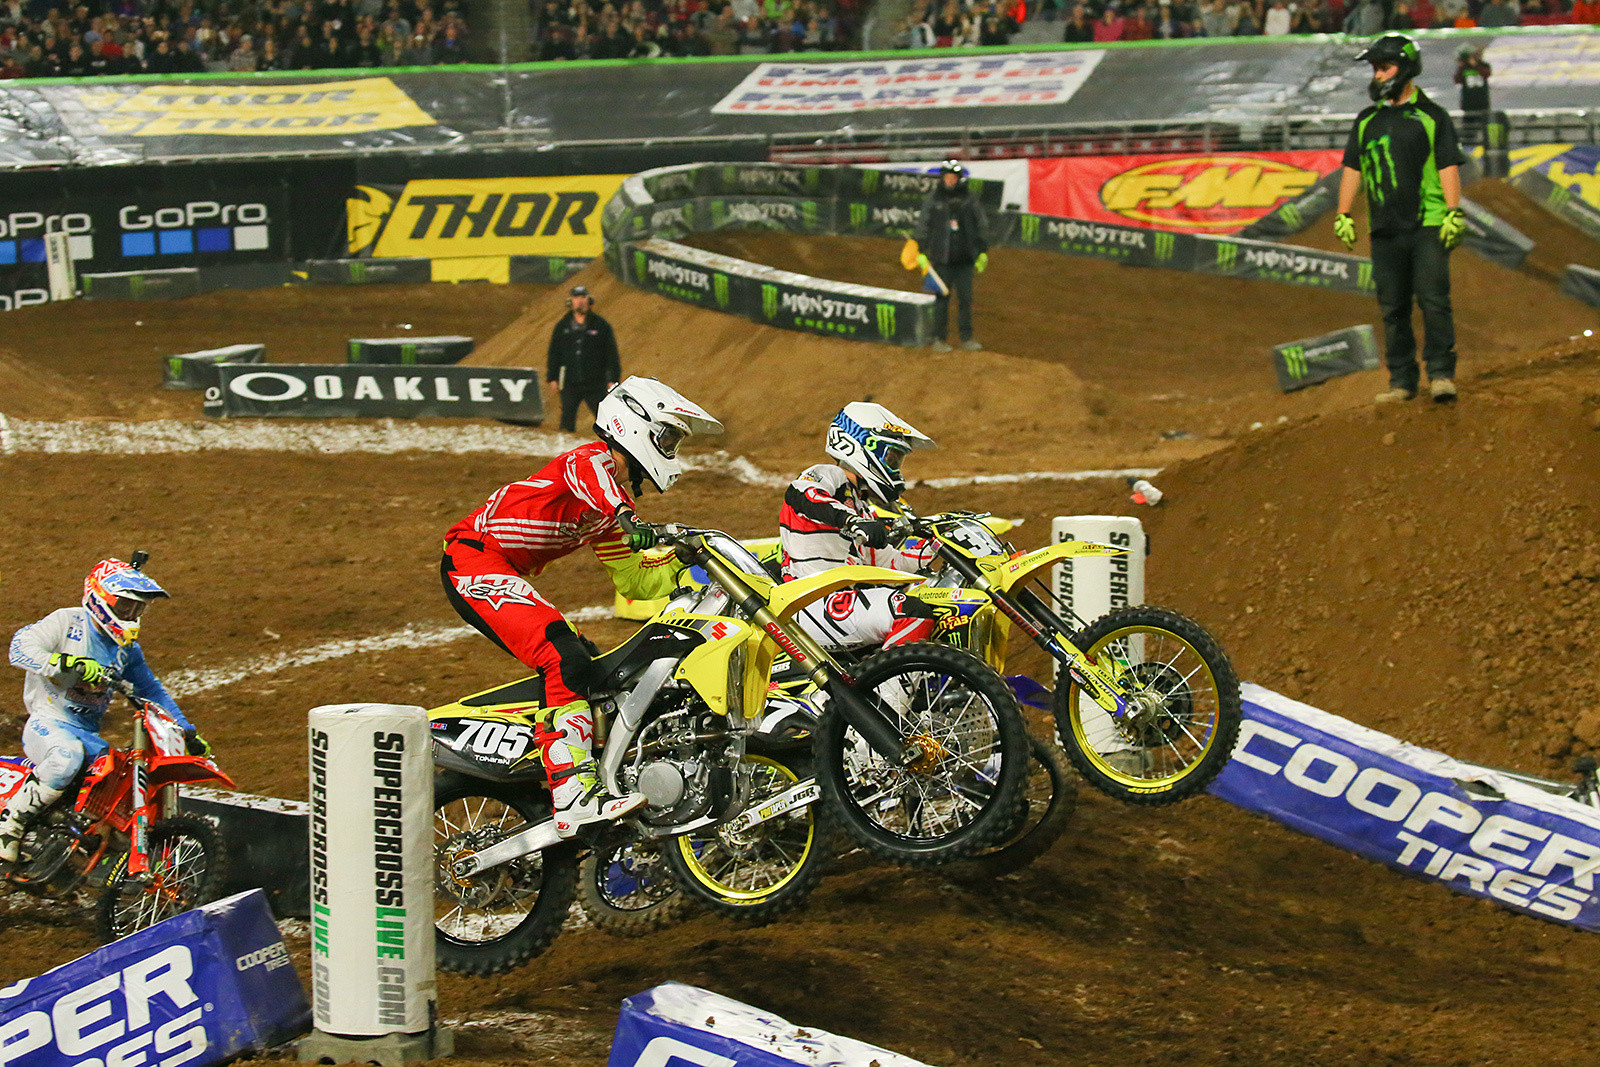 Steven Tokarski and Phil Nicoletti - Photo Blast: Glendale - Motocross Pictures - Vital MX